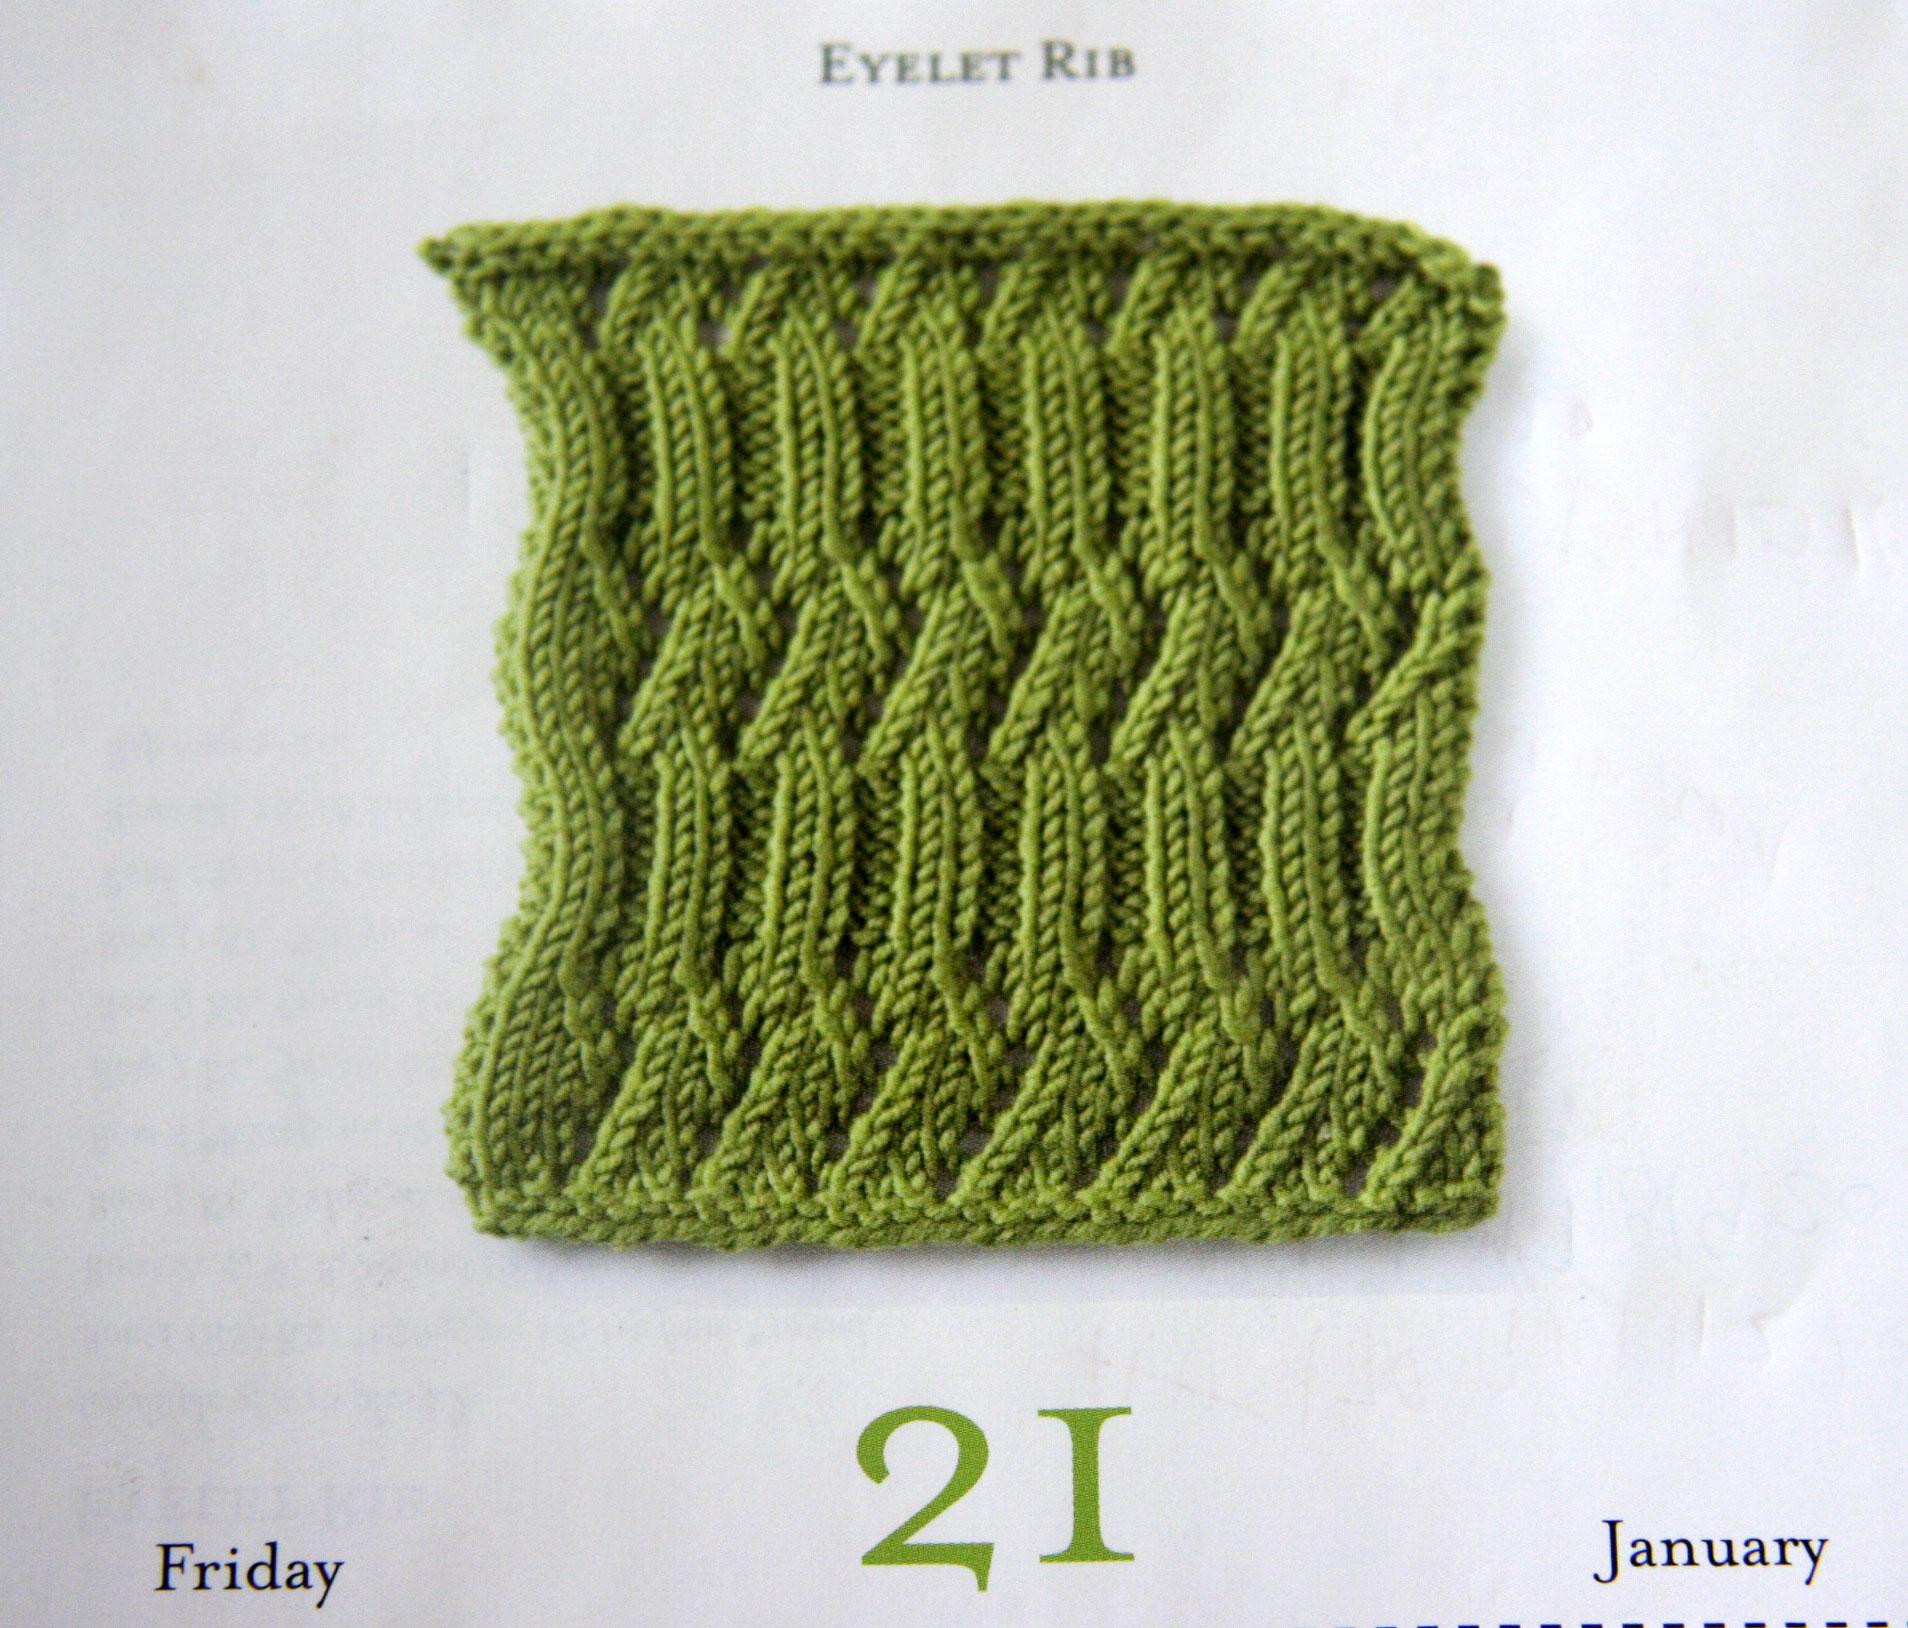 Vogue Knitting Stitch A Day Calendar : Eyelet Rib Cpeezers